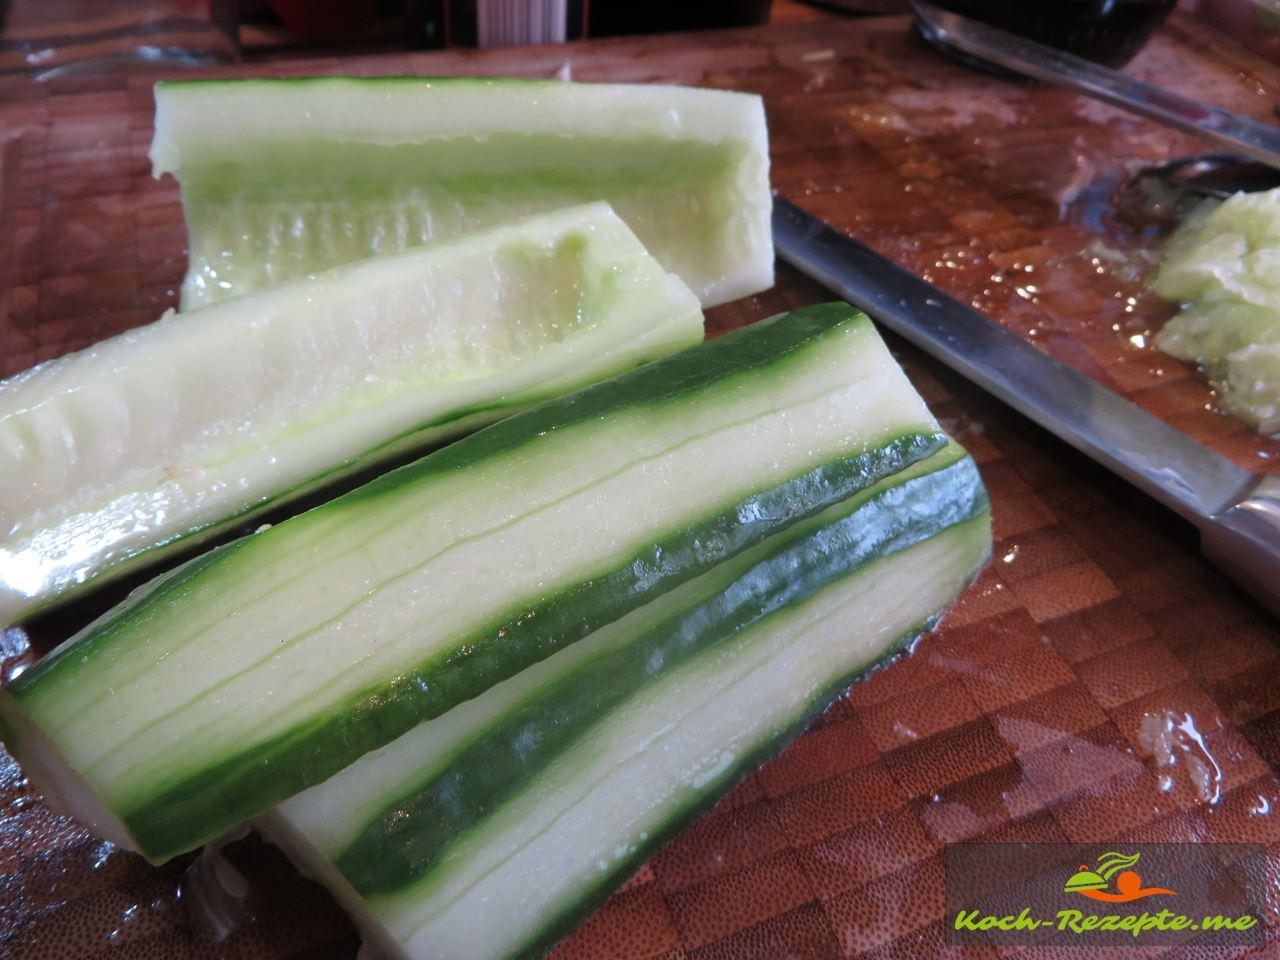 Salatgurke  für einen Brotsalat Rezept